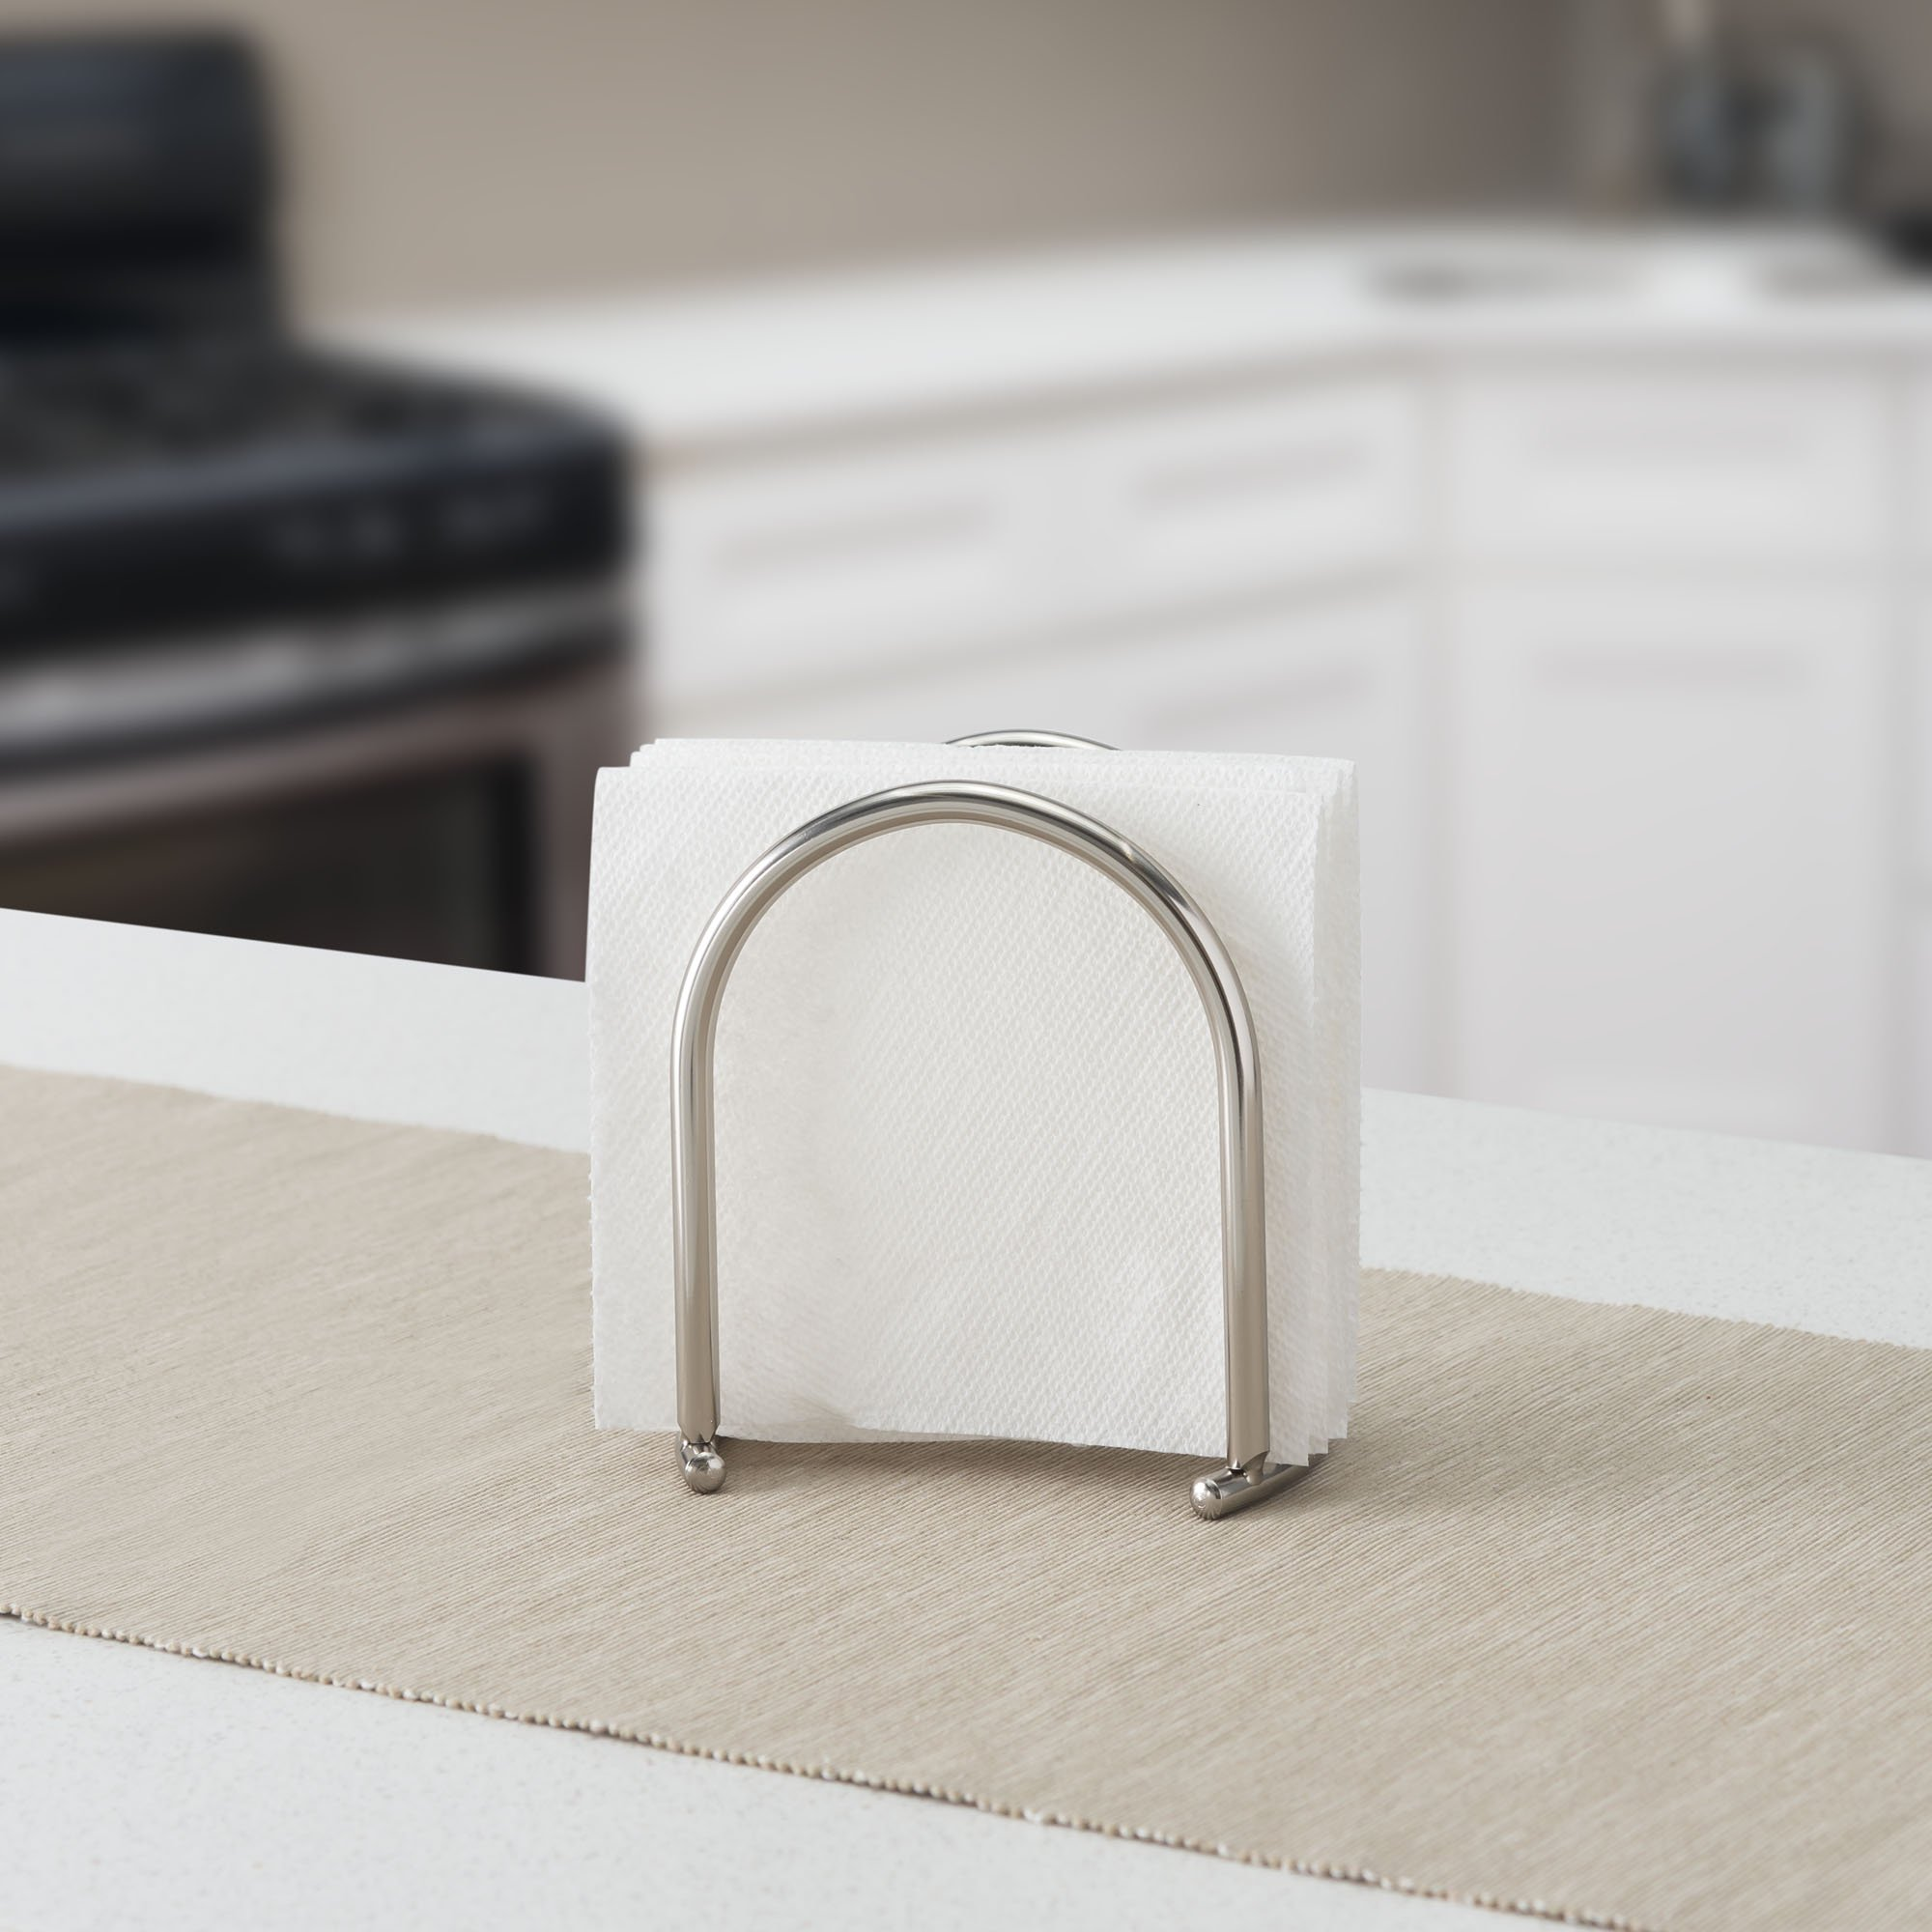 Home Basics Napkin Holder Satin Nickel Simplicity Collection